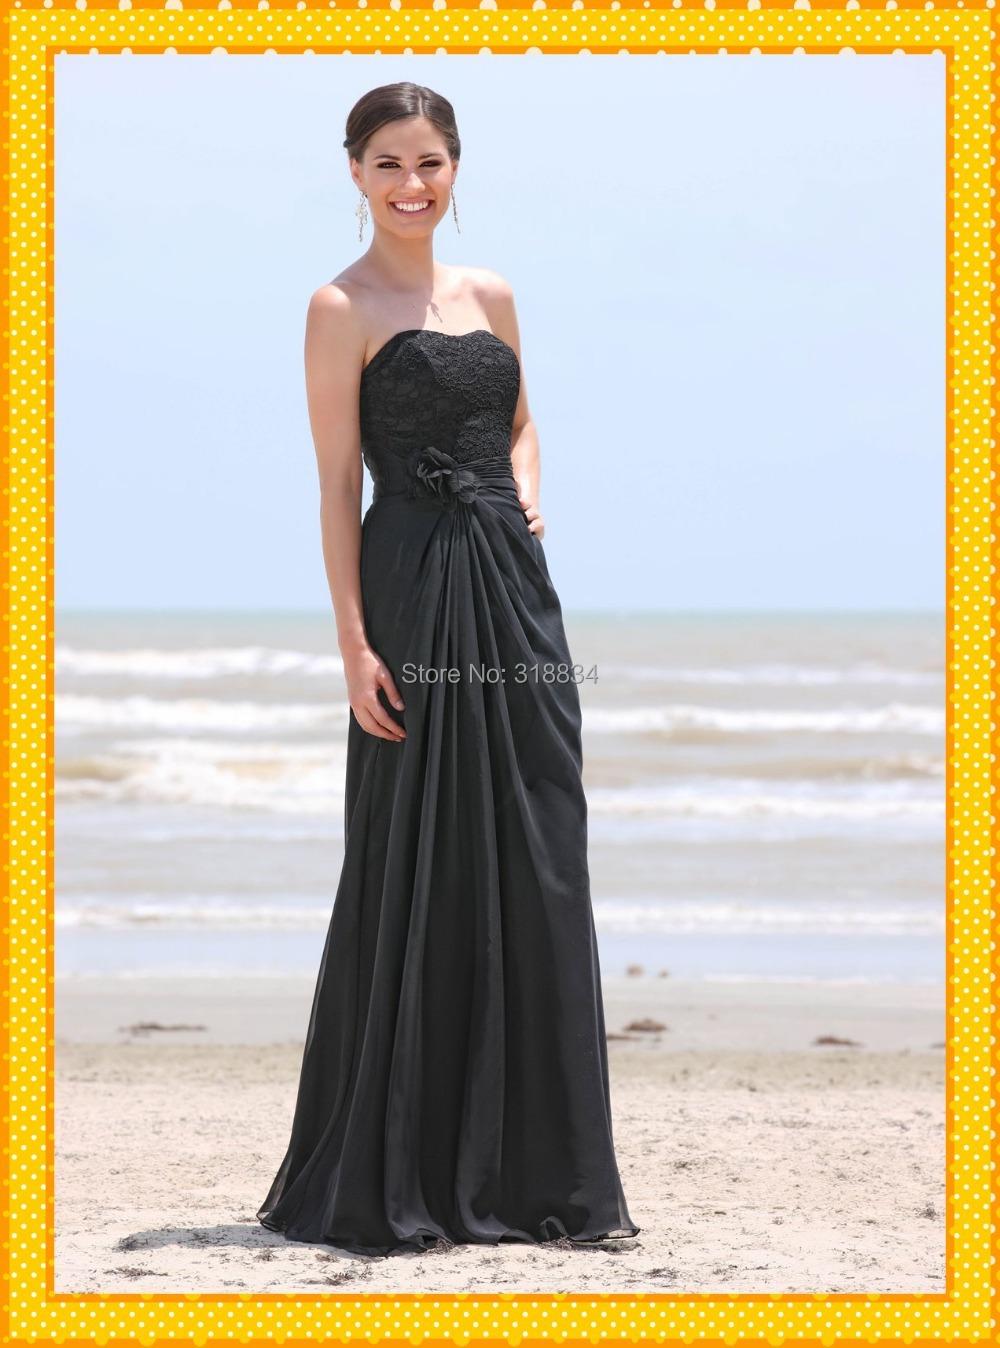 Long bridesmaid dresses for beach wedding long bridesmaid dresses for beach wedding 37 ombrellifo Gallery